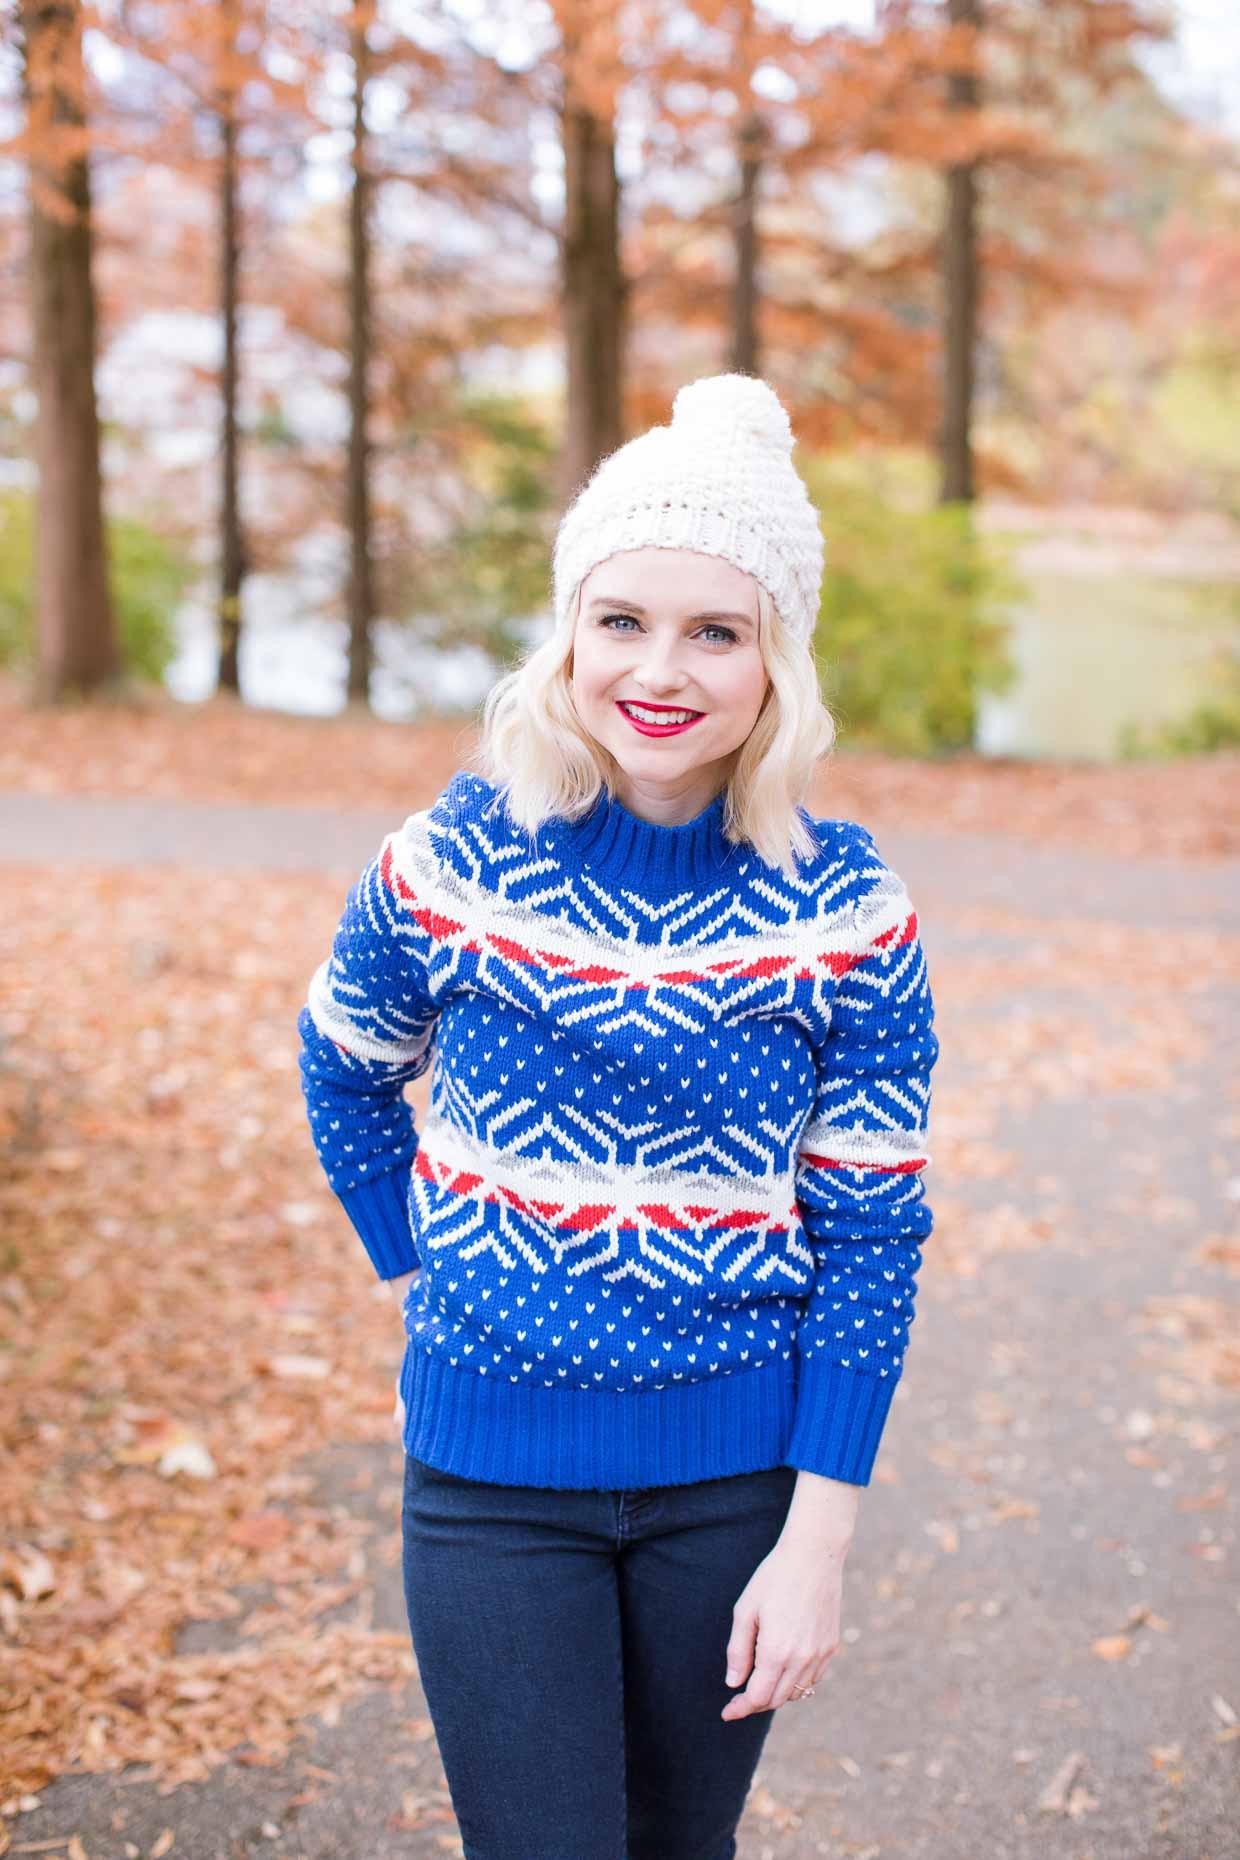 Christmas Sweater - Poor Little It Girl